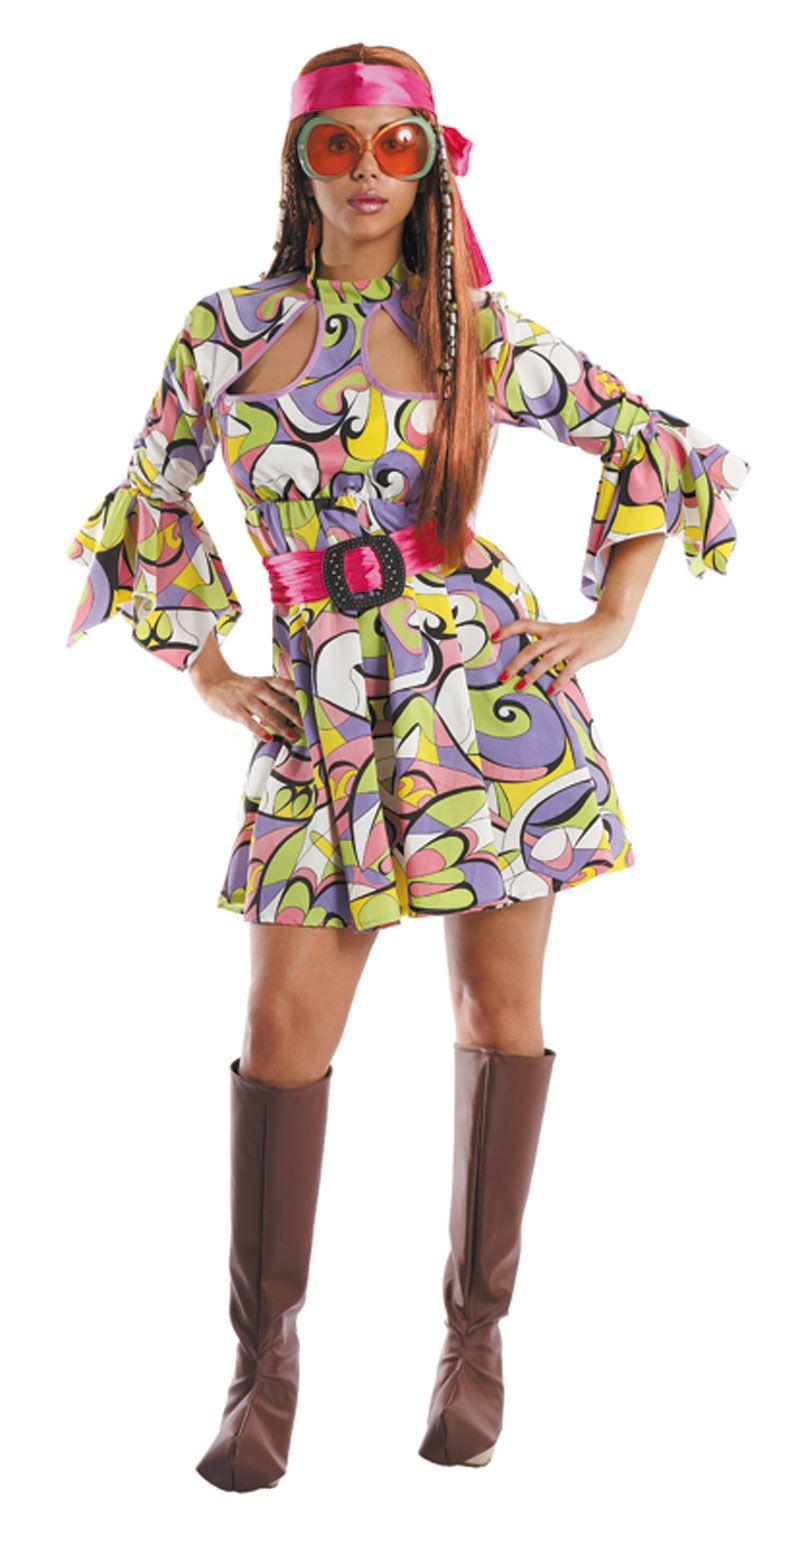 Disfraz de hippie 70s disfraces de mujer pinterest for Disfraz de hippie